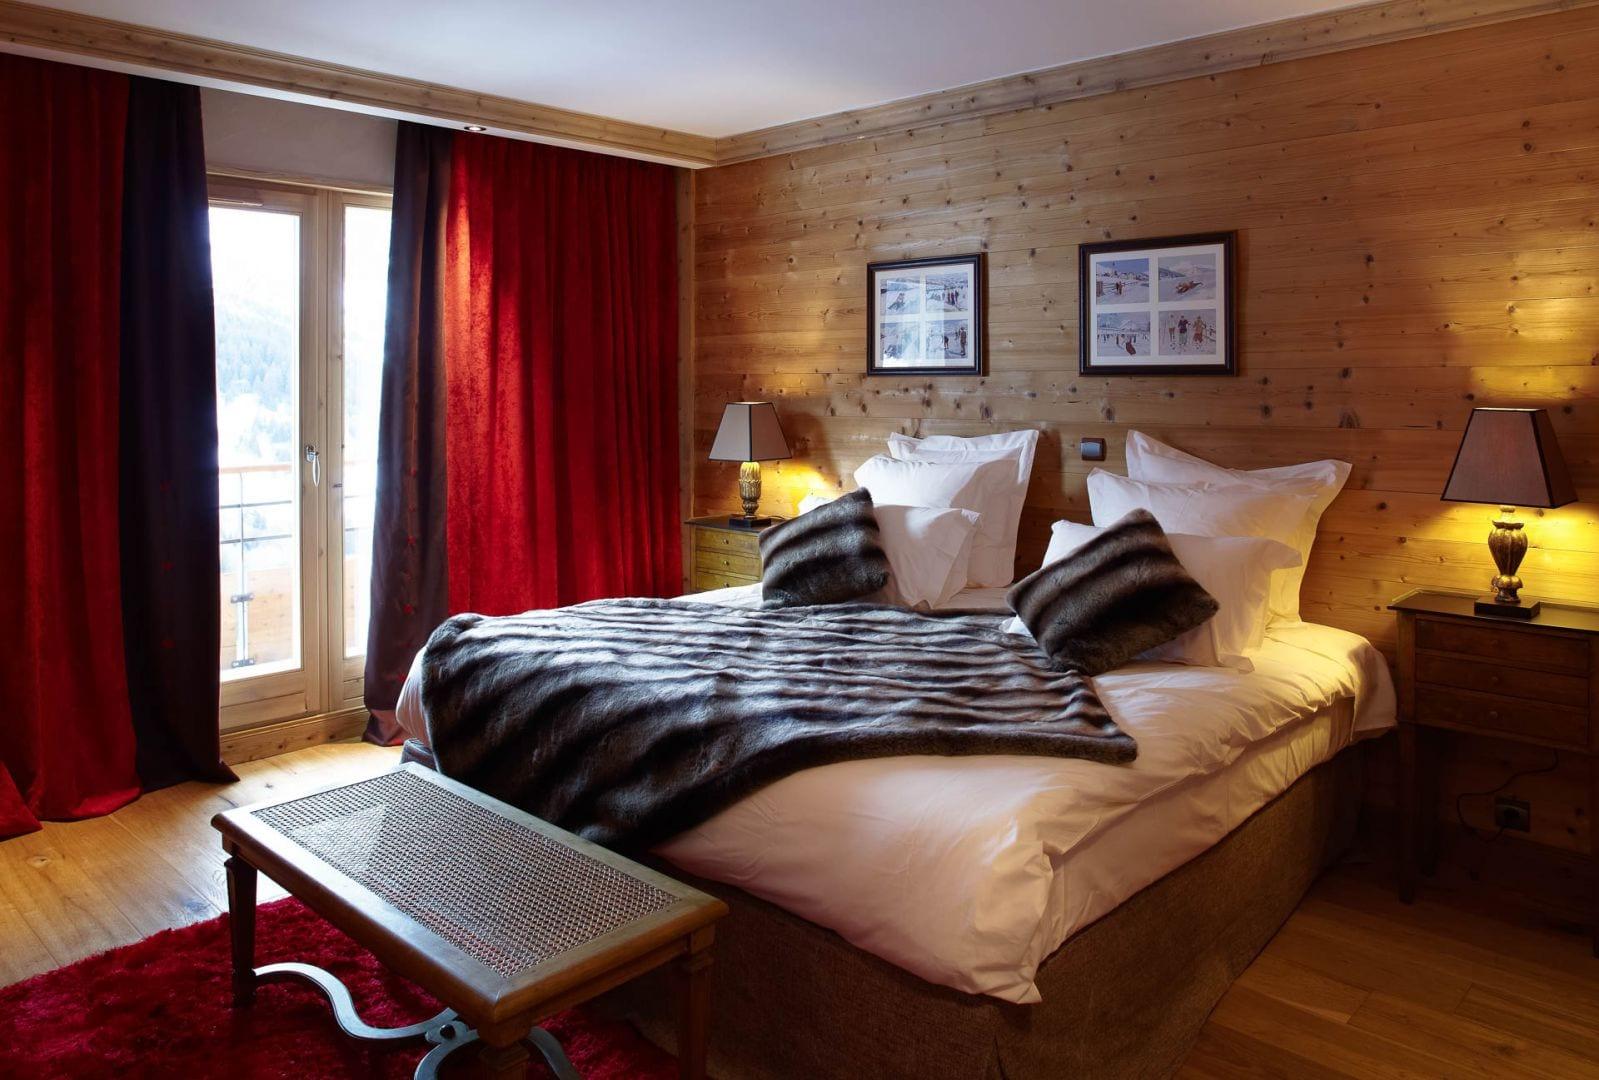 helios-hotel-meribel-28850-big